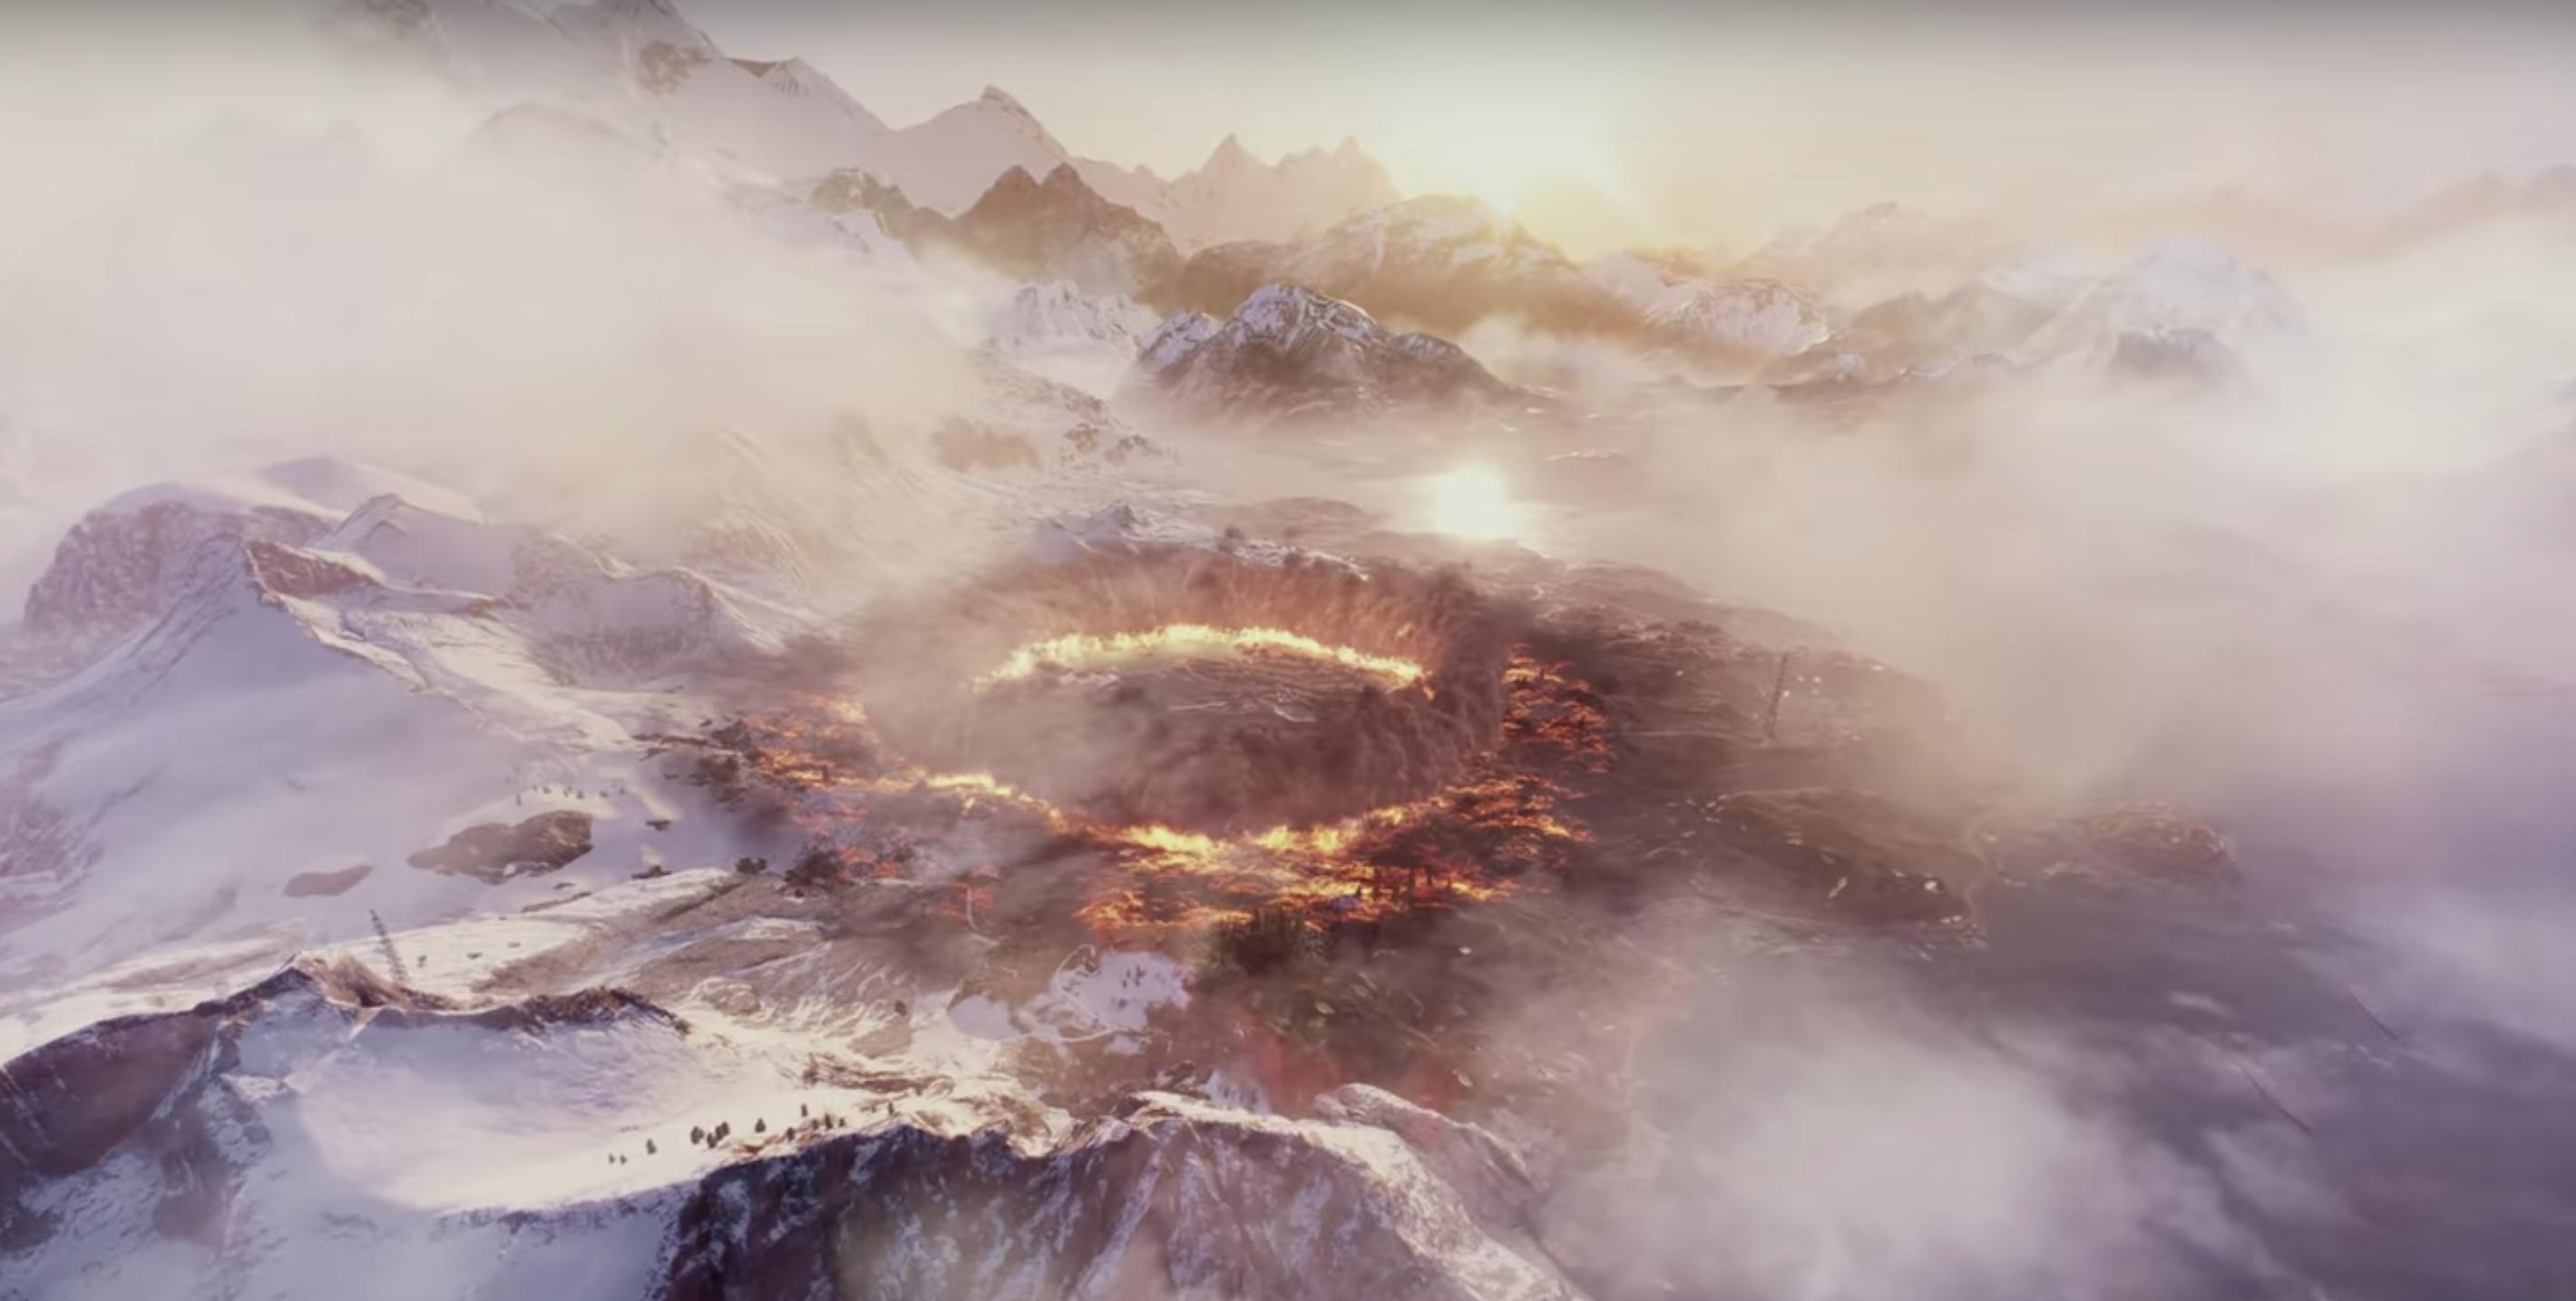 New Battlefield V trailer gives a glimpse of Battle Royale mode